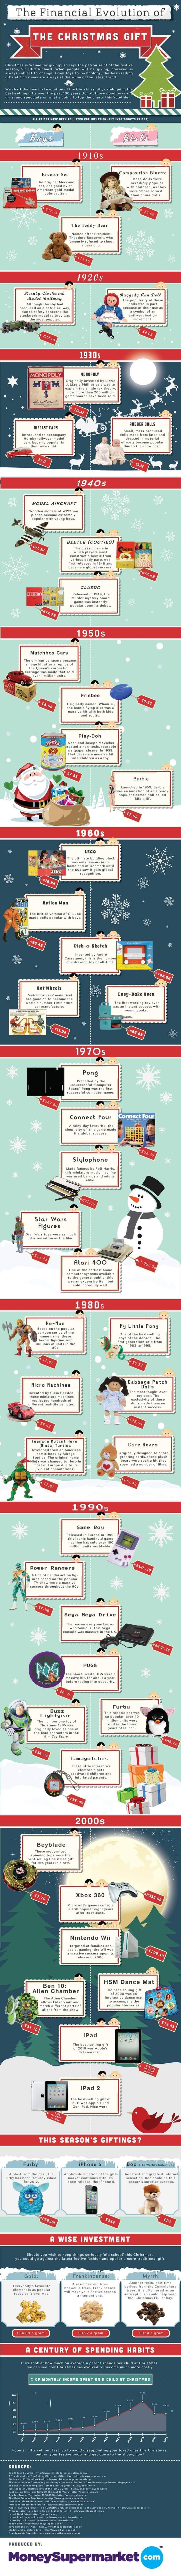 Financial Evolution of The Christmas Gift